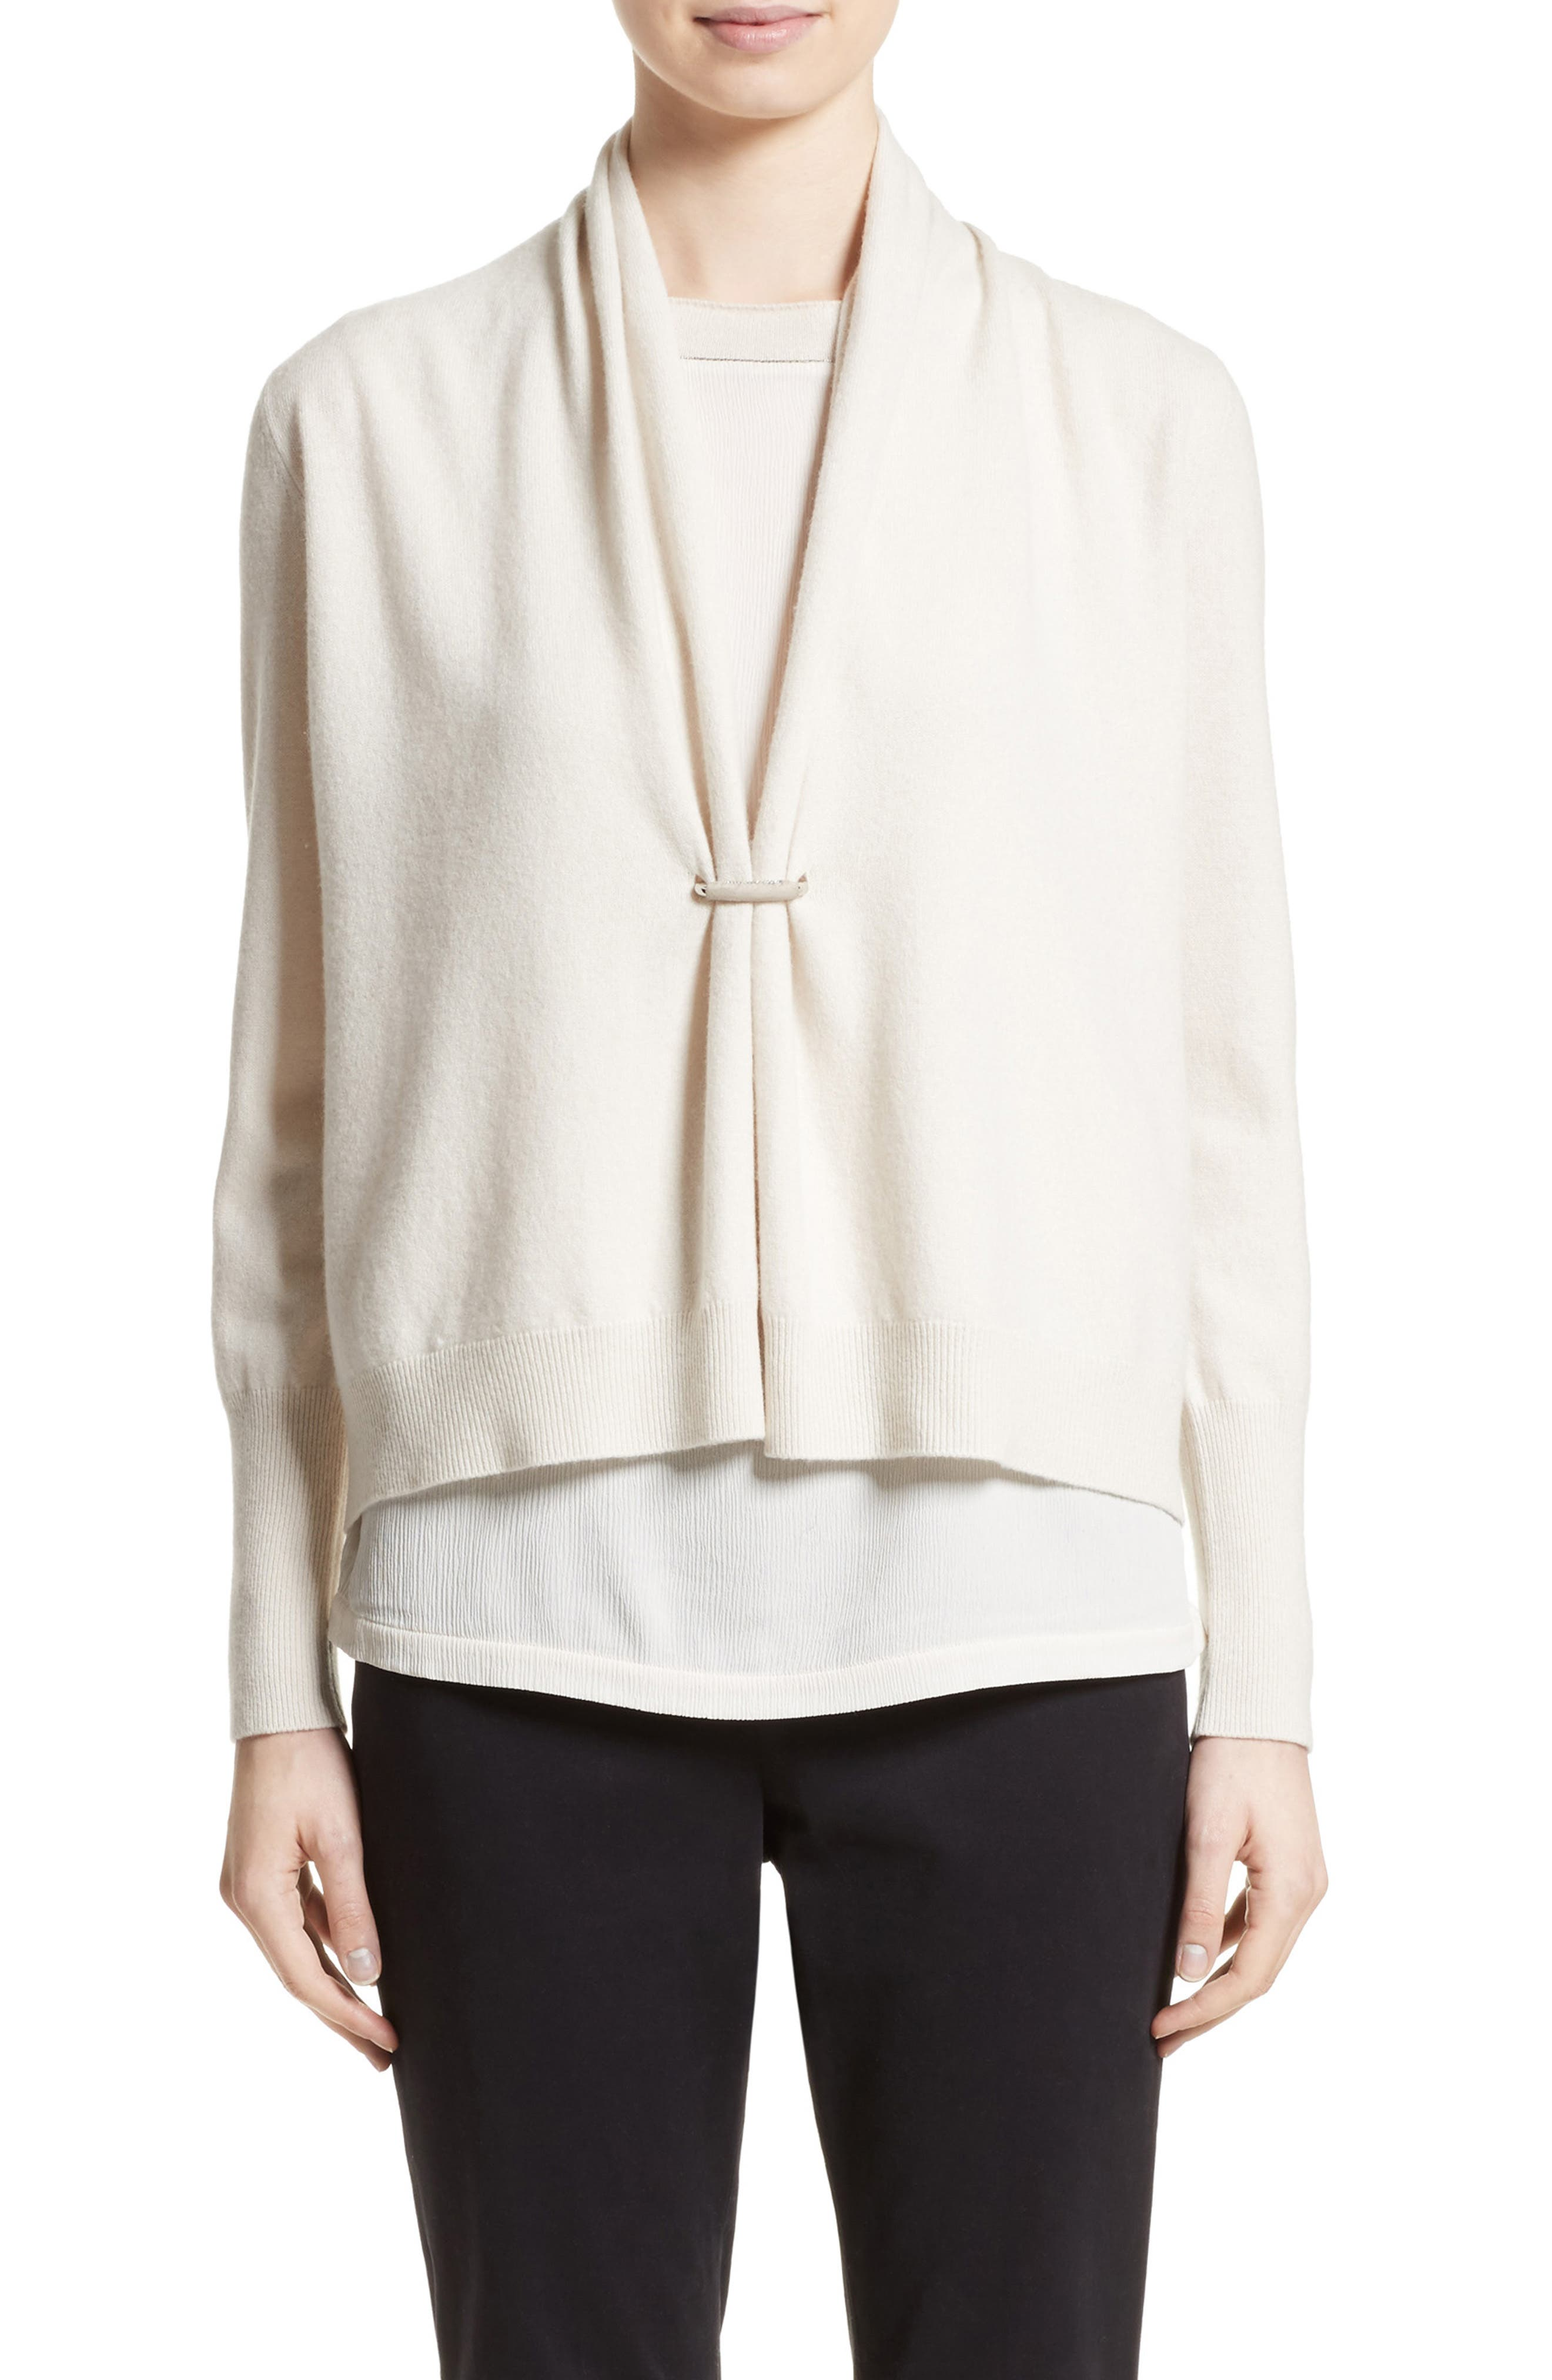 Main Image - Fabiana Filippi Wool, Silk & Cashmere Shawl Collar Cardigan